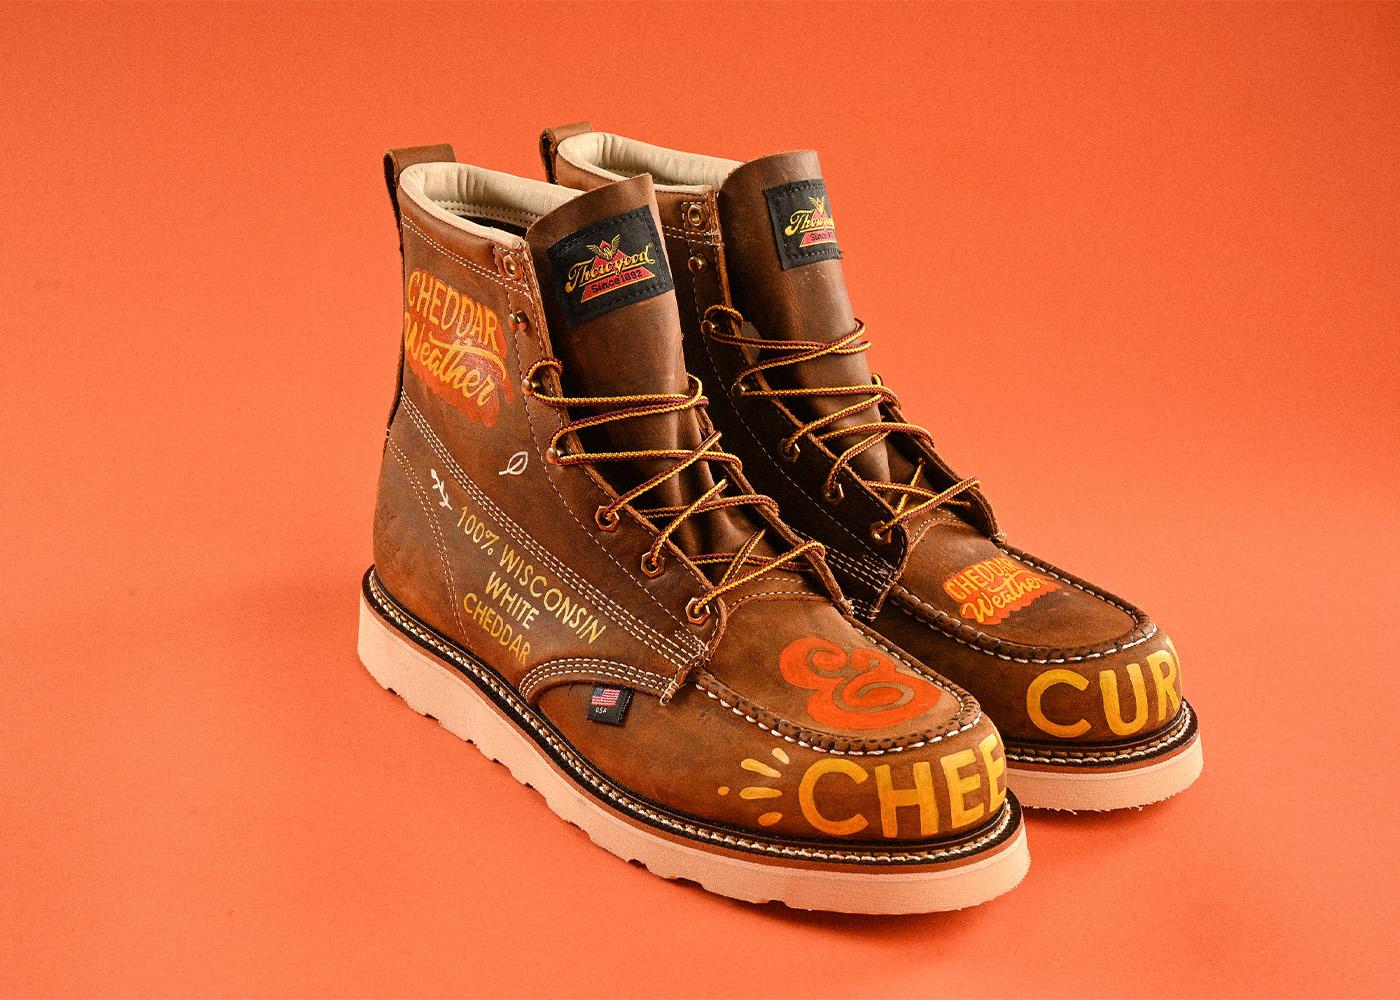 Cheddar Weather Boots on orange background.